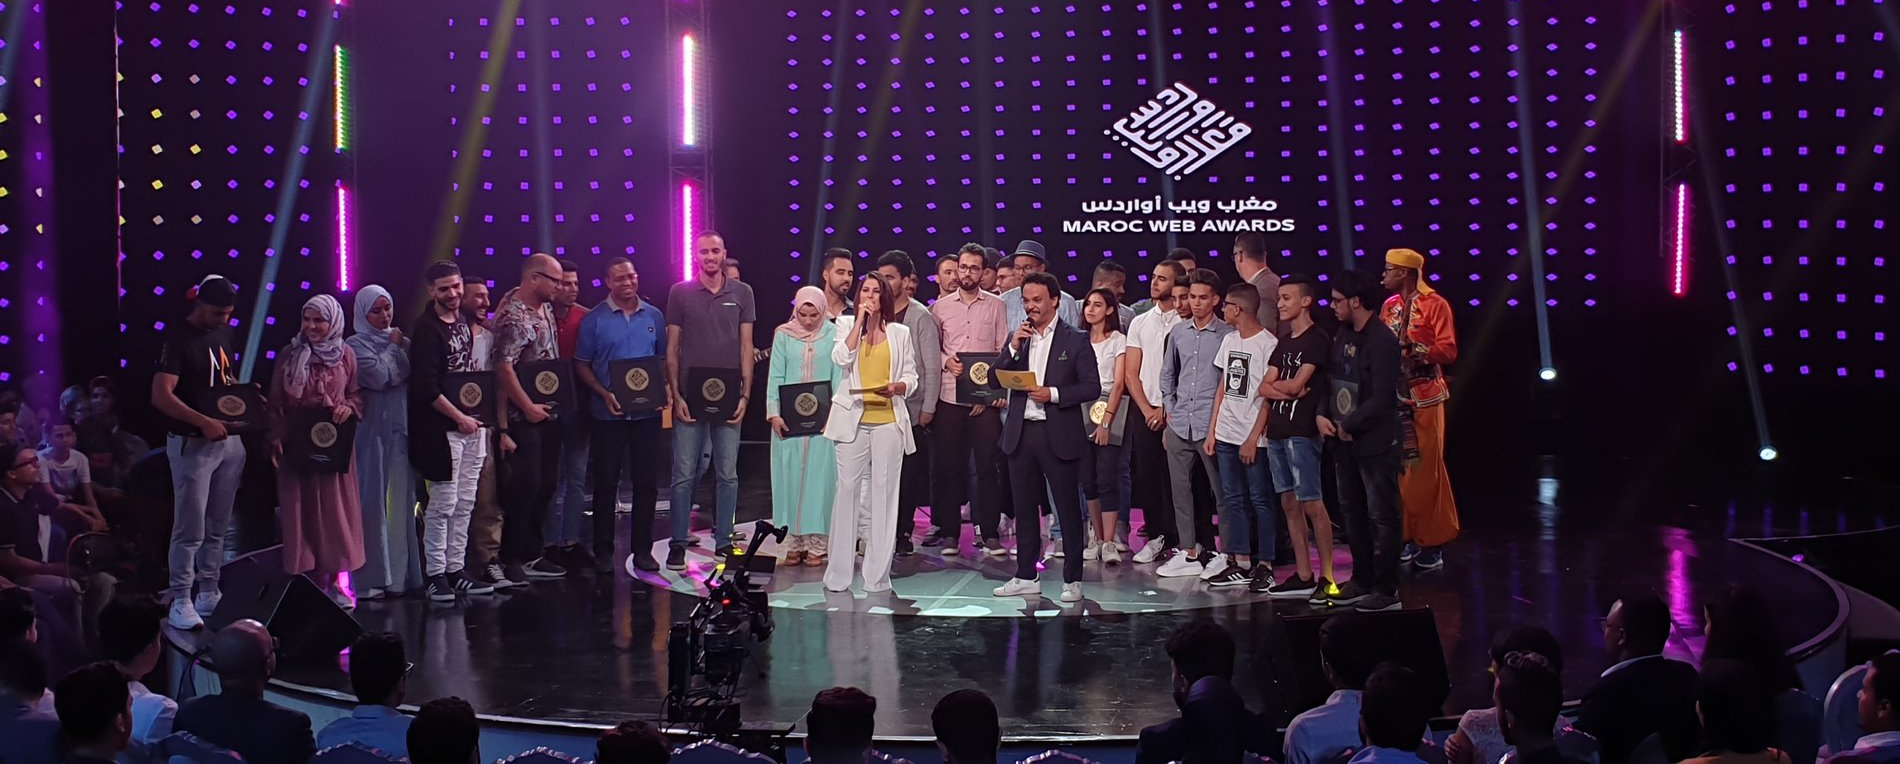 Maroc Web Awards - Gagnants #MWA12